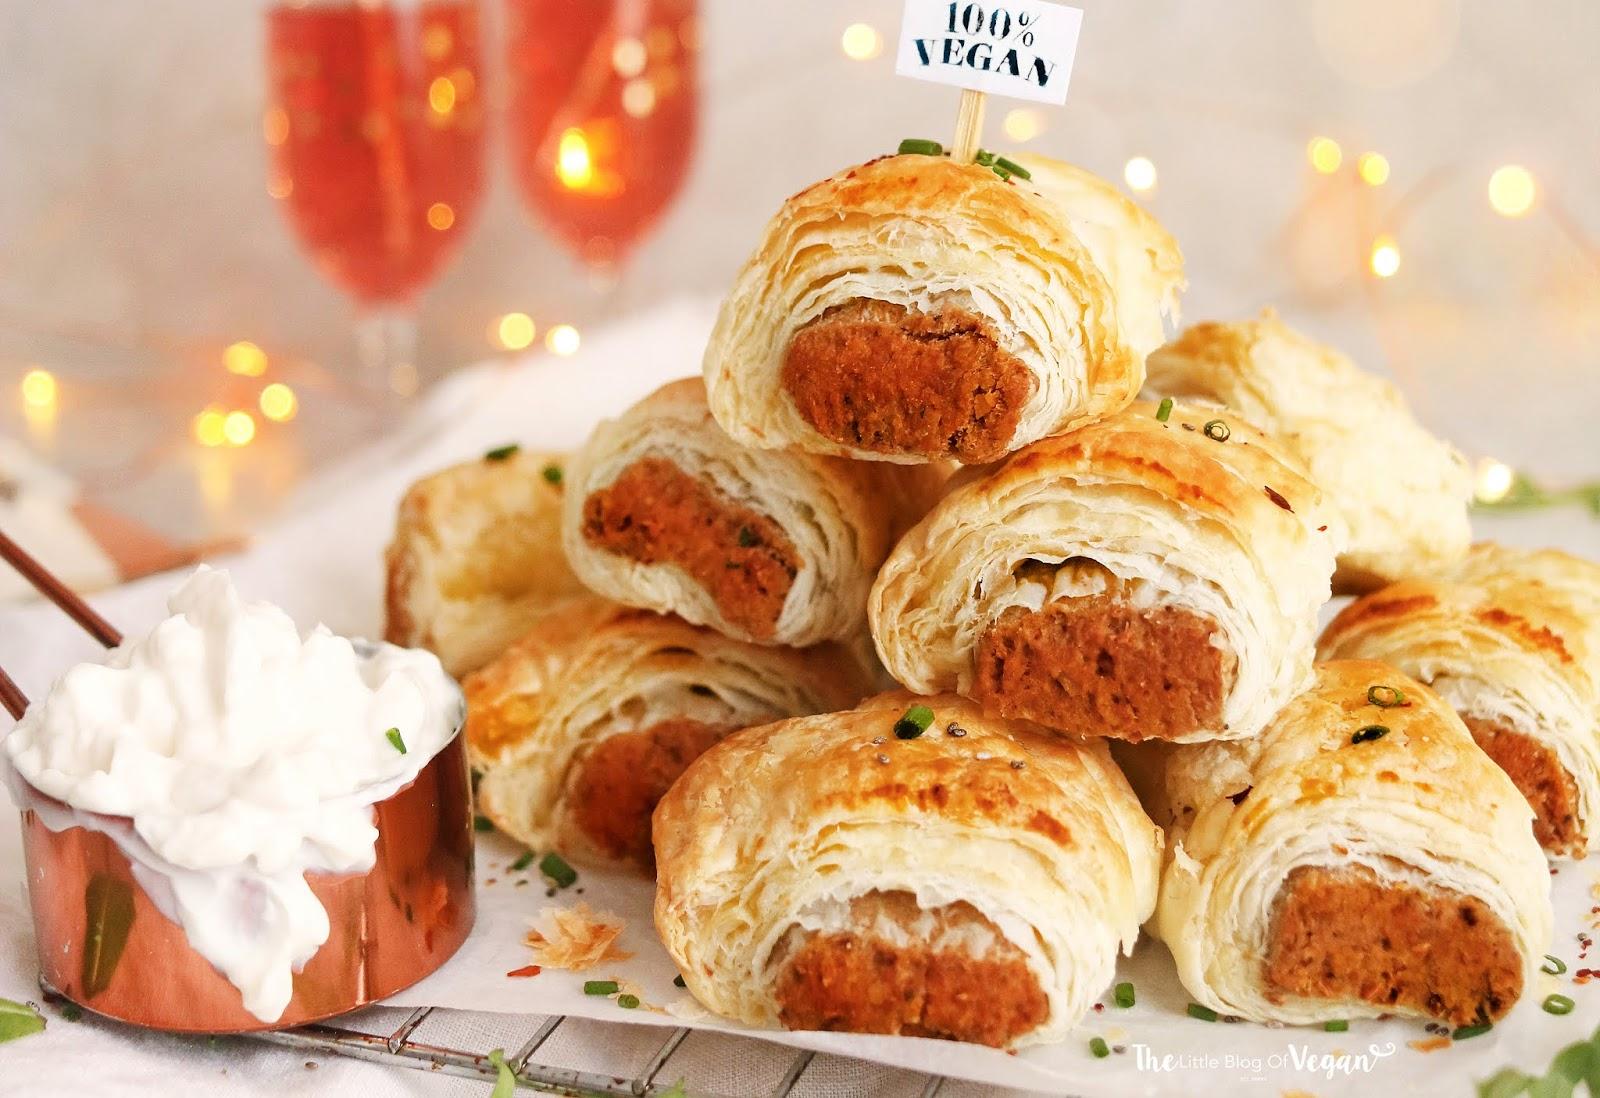 Vegan and Gluten-Free Sausage Rolls